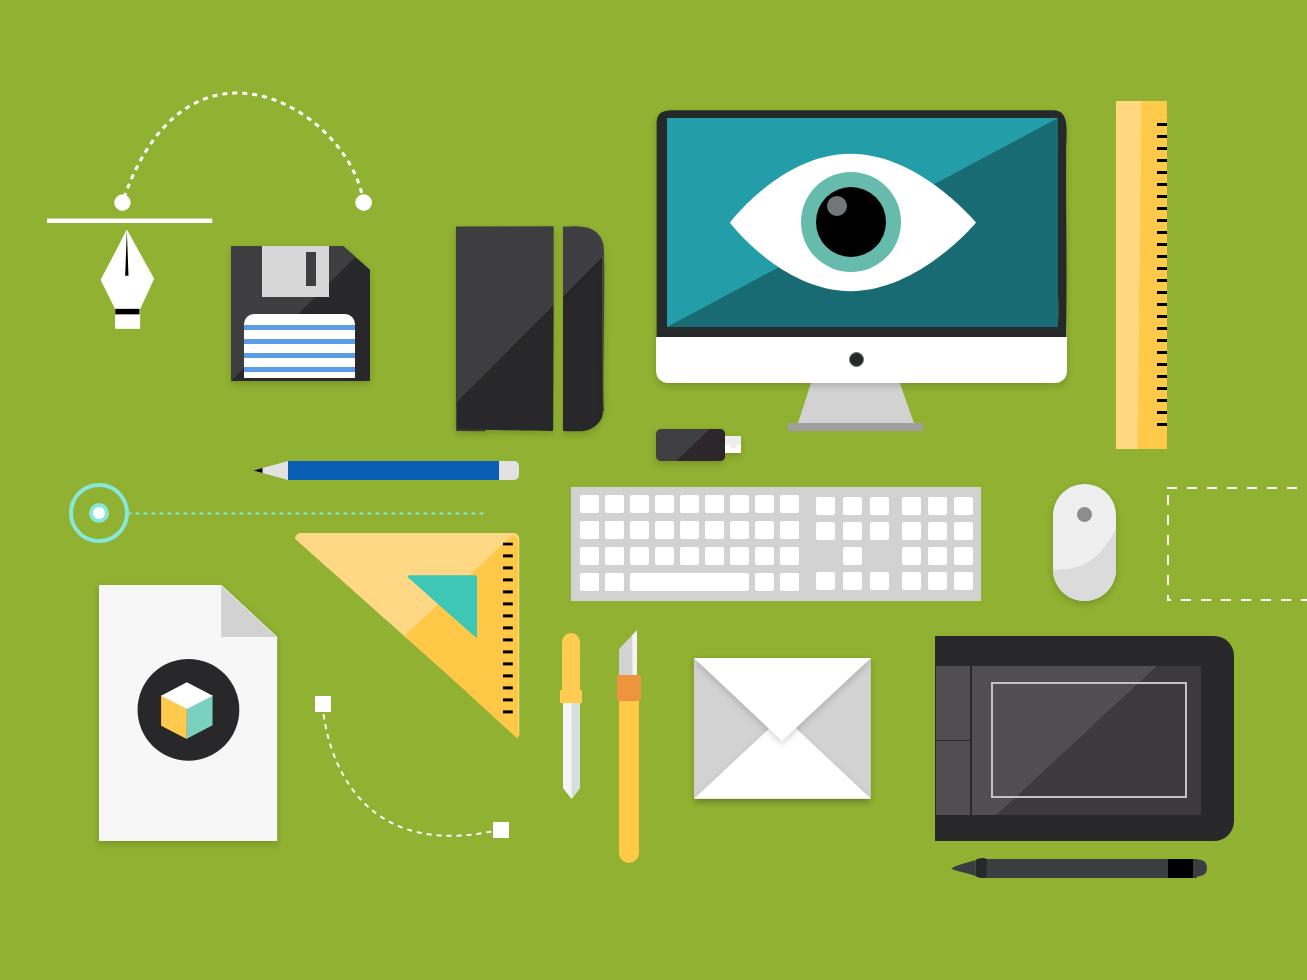 illustration for IT Industries it industries icons design vector illustration design